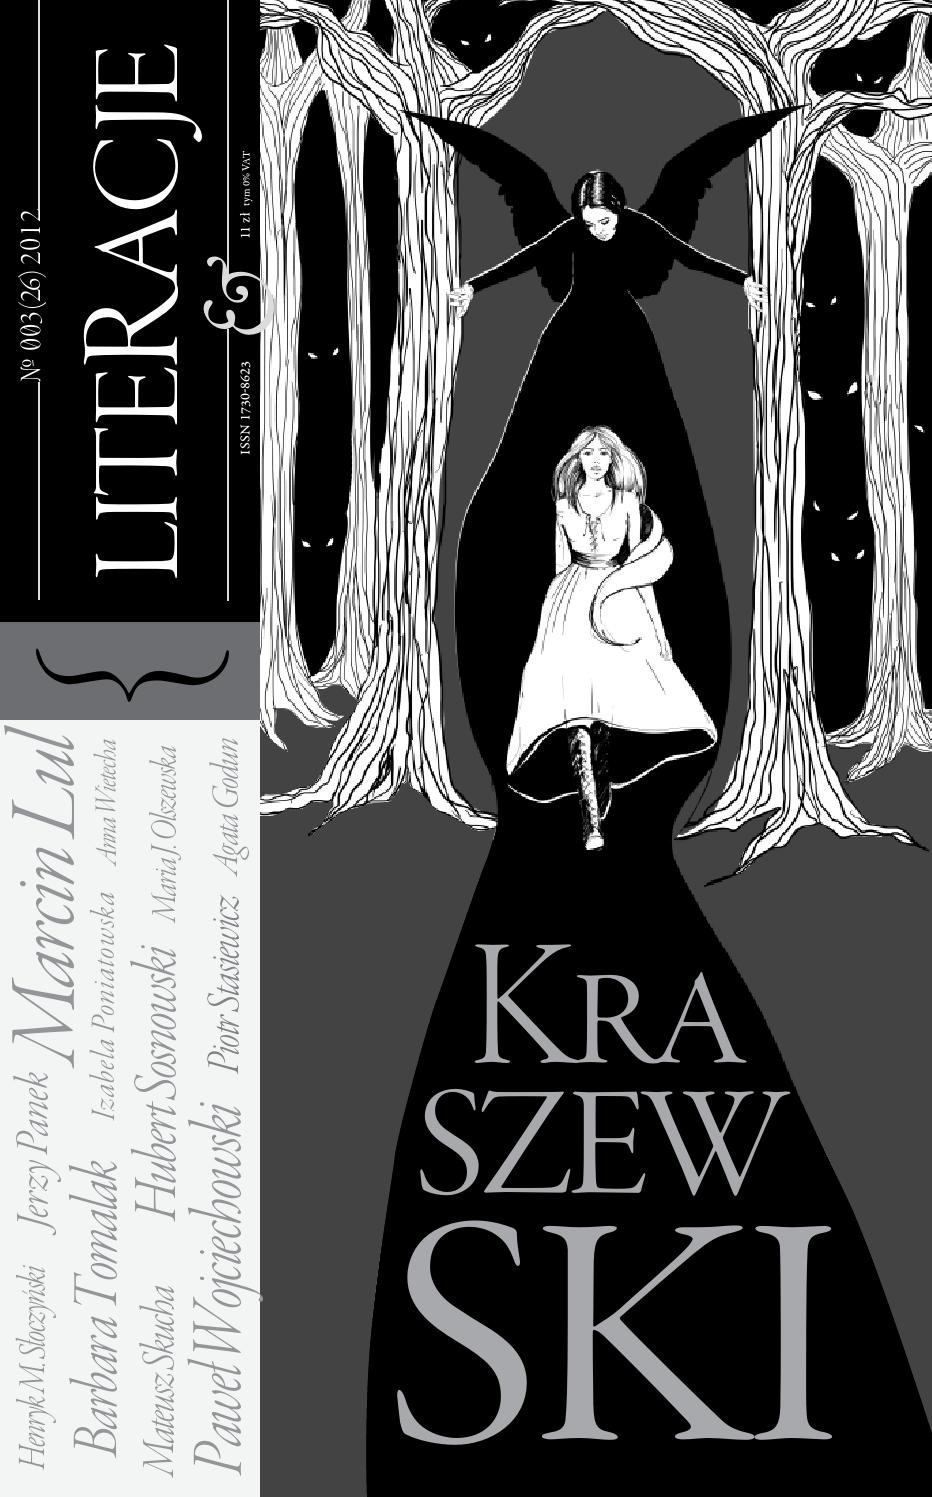 Kraszewski By Karol Karol Issuu